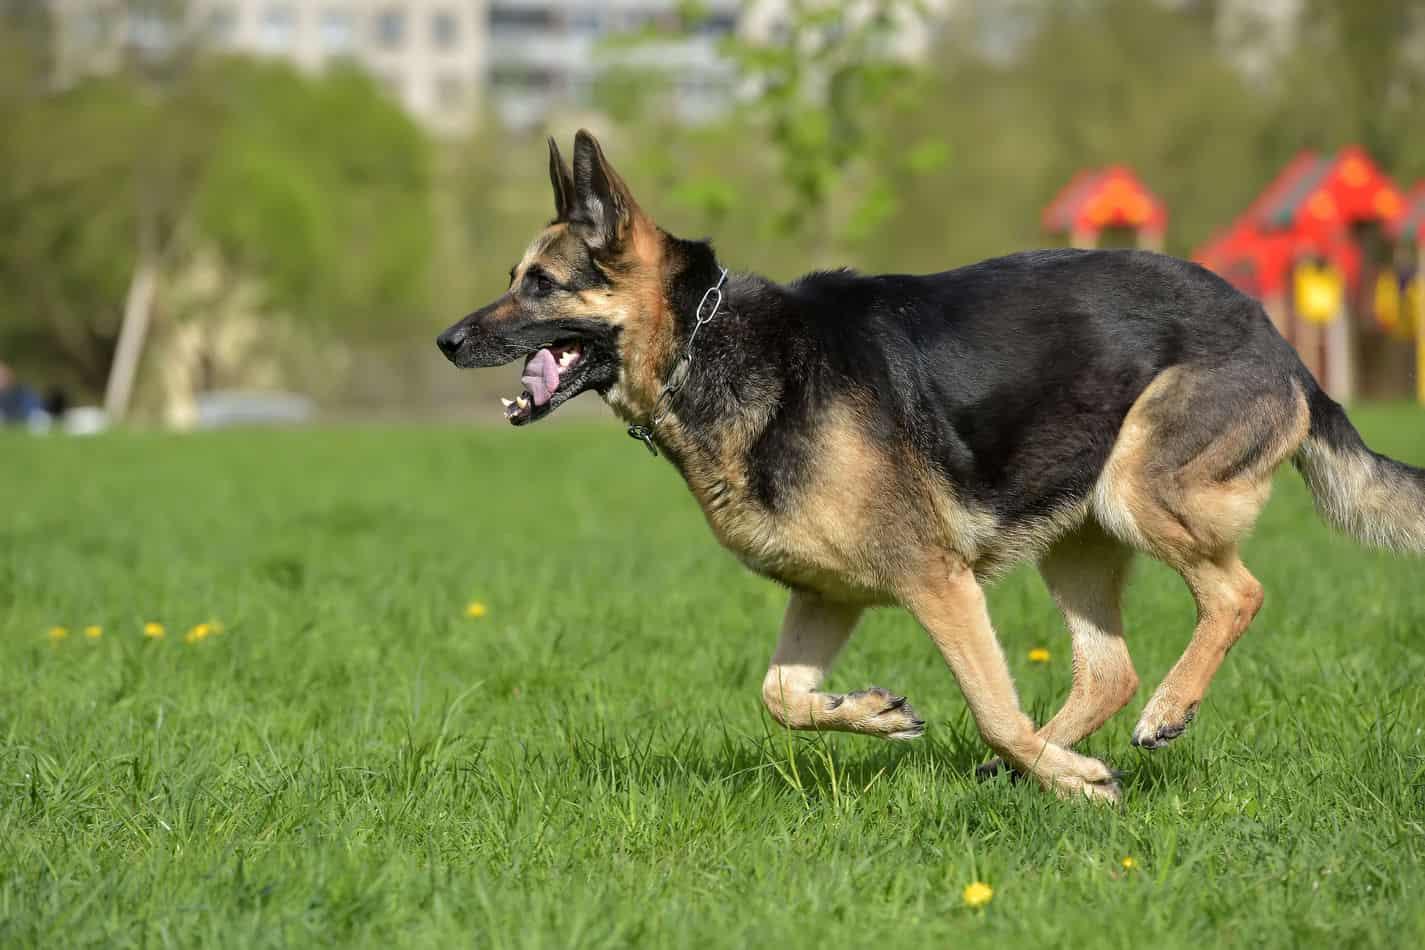 Can German Shepherds Run Long Distances?